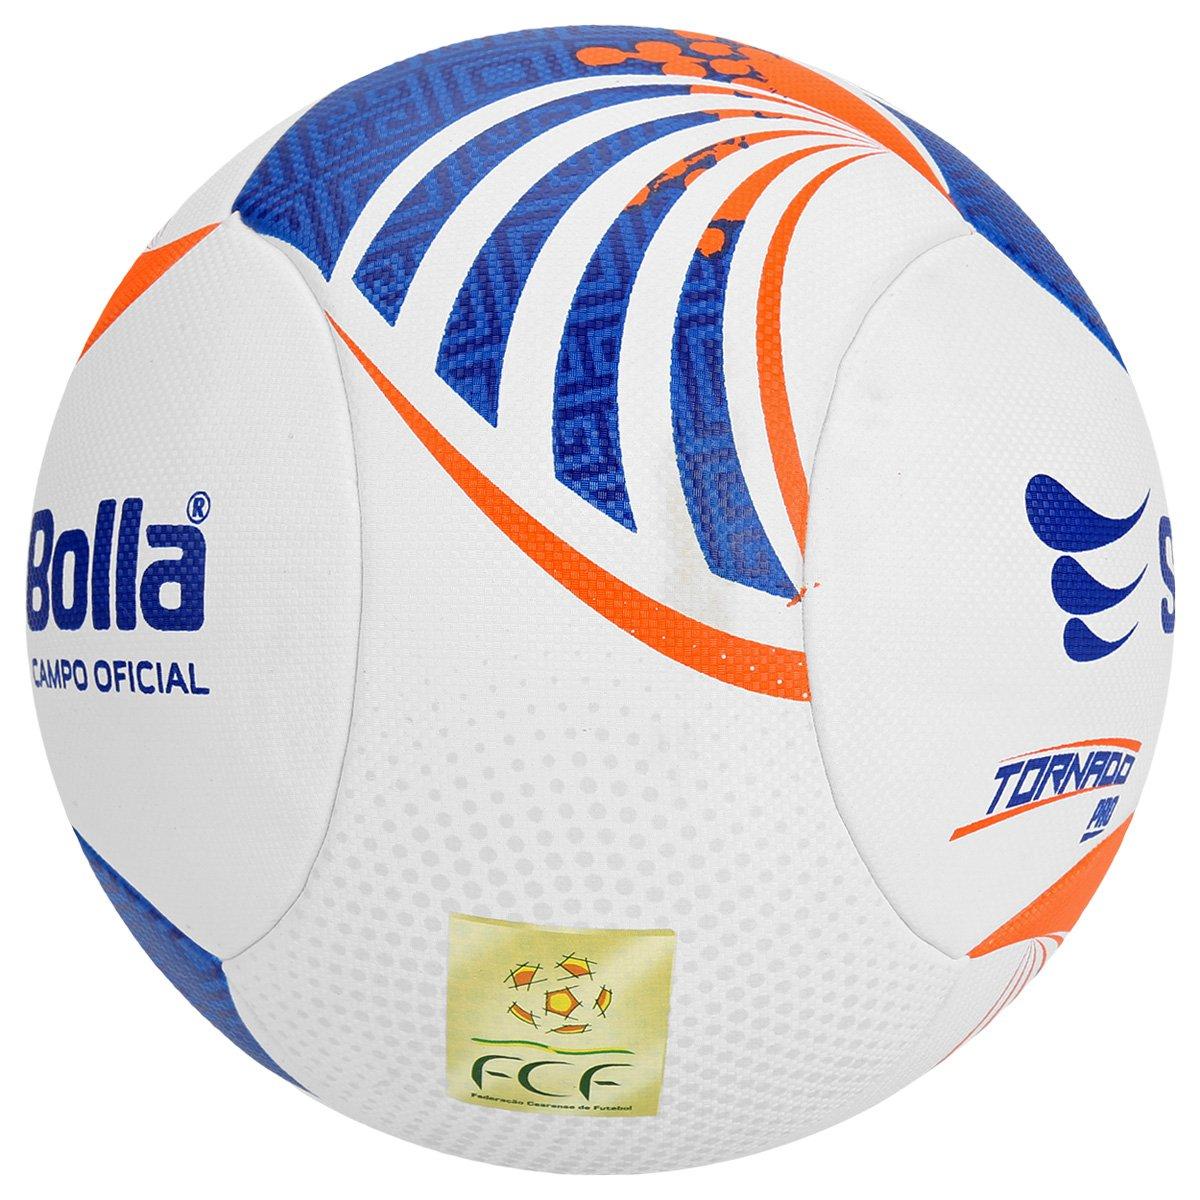 Bola Futebol Campo Super Bolla Tornado Pro 6 Gomos FCF - Compre ... c696993f6fadb